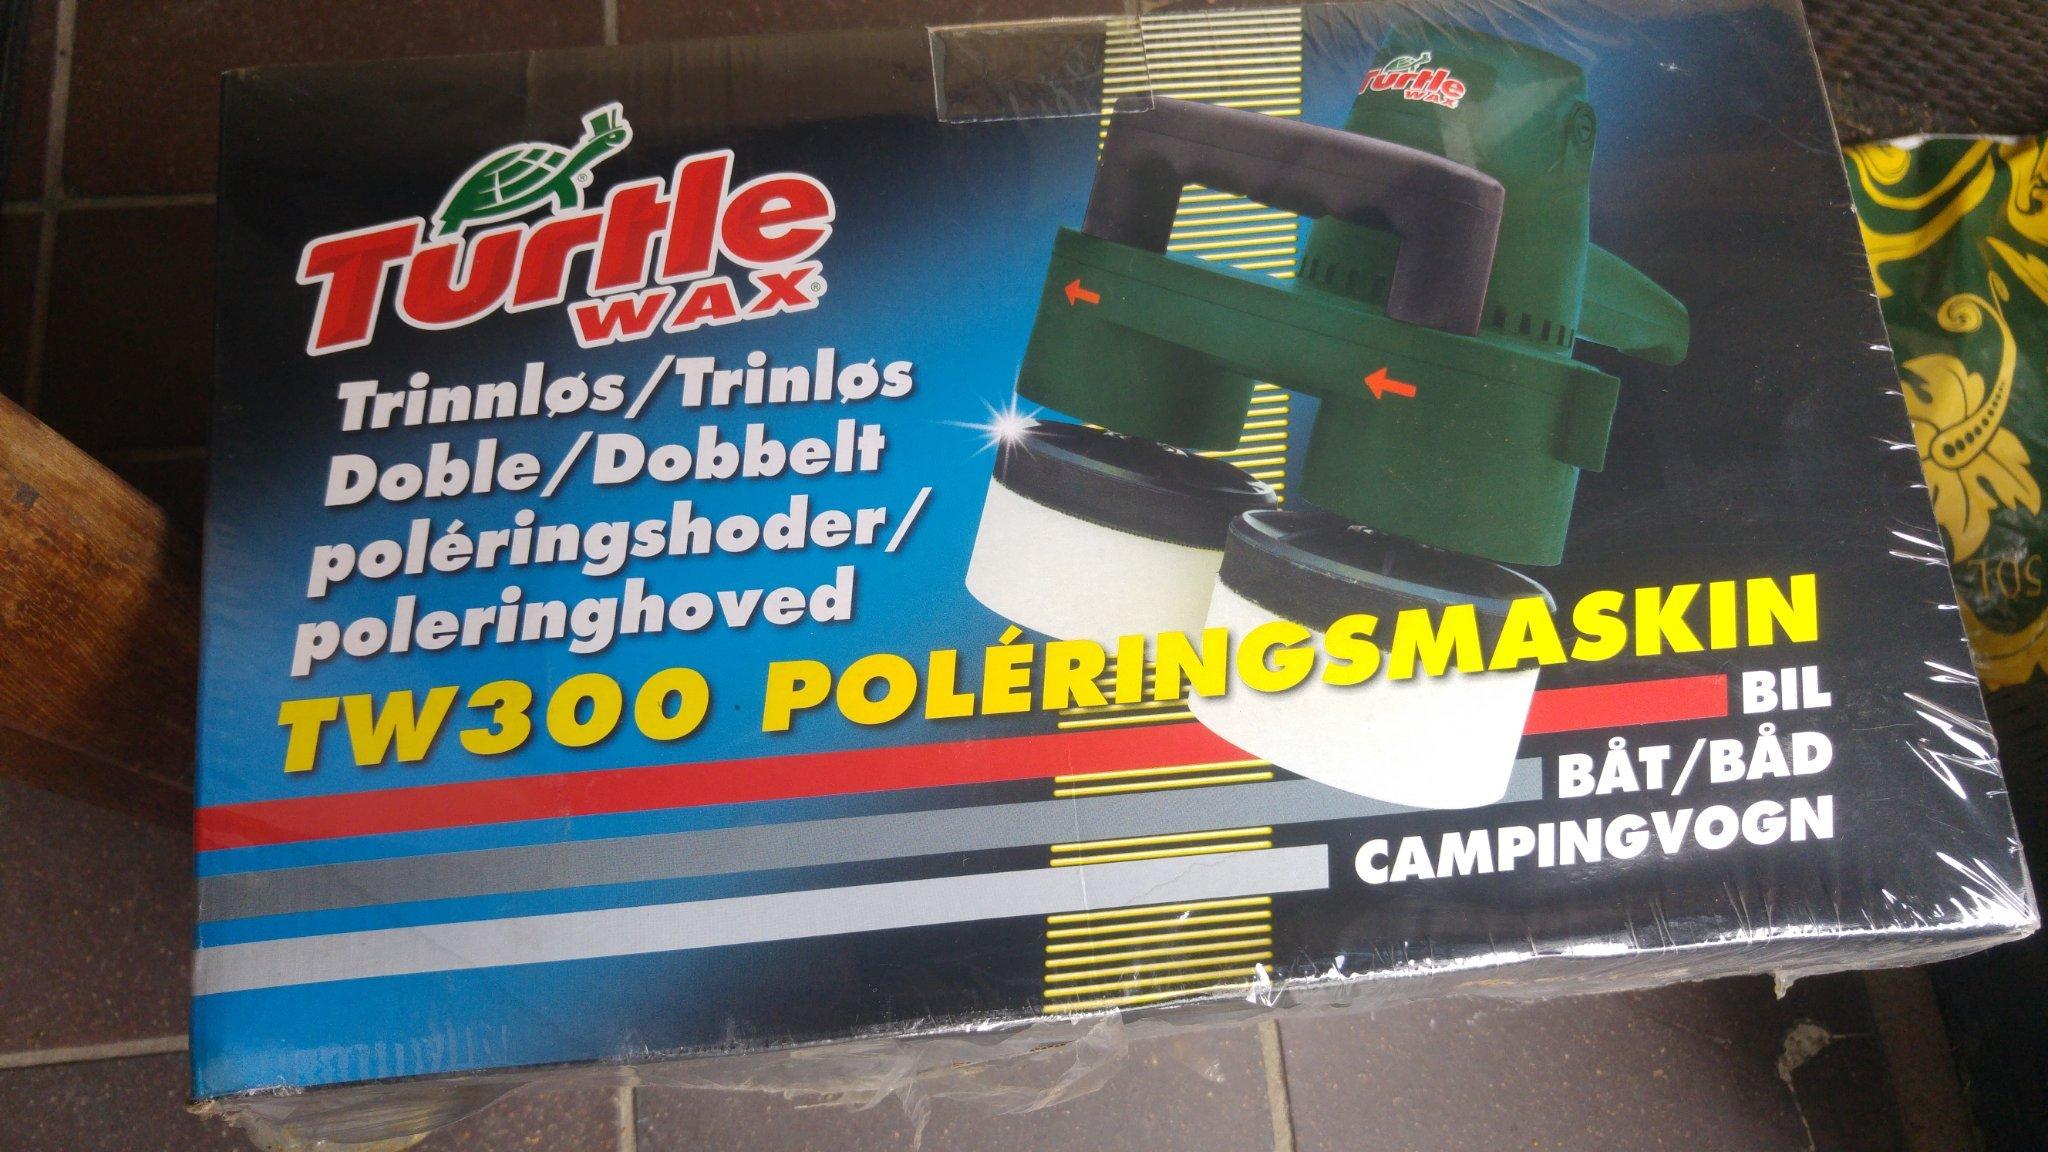 Berömda Polermaskin Turtle wax tw300 till båt eller bil (358267226) ᐈ Köp GX-88